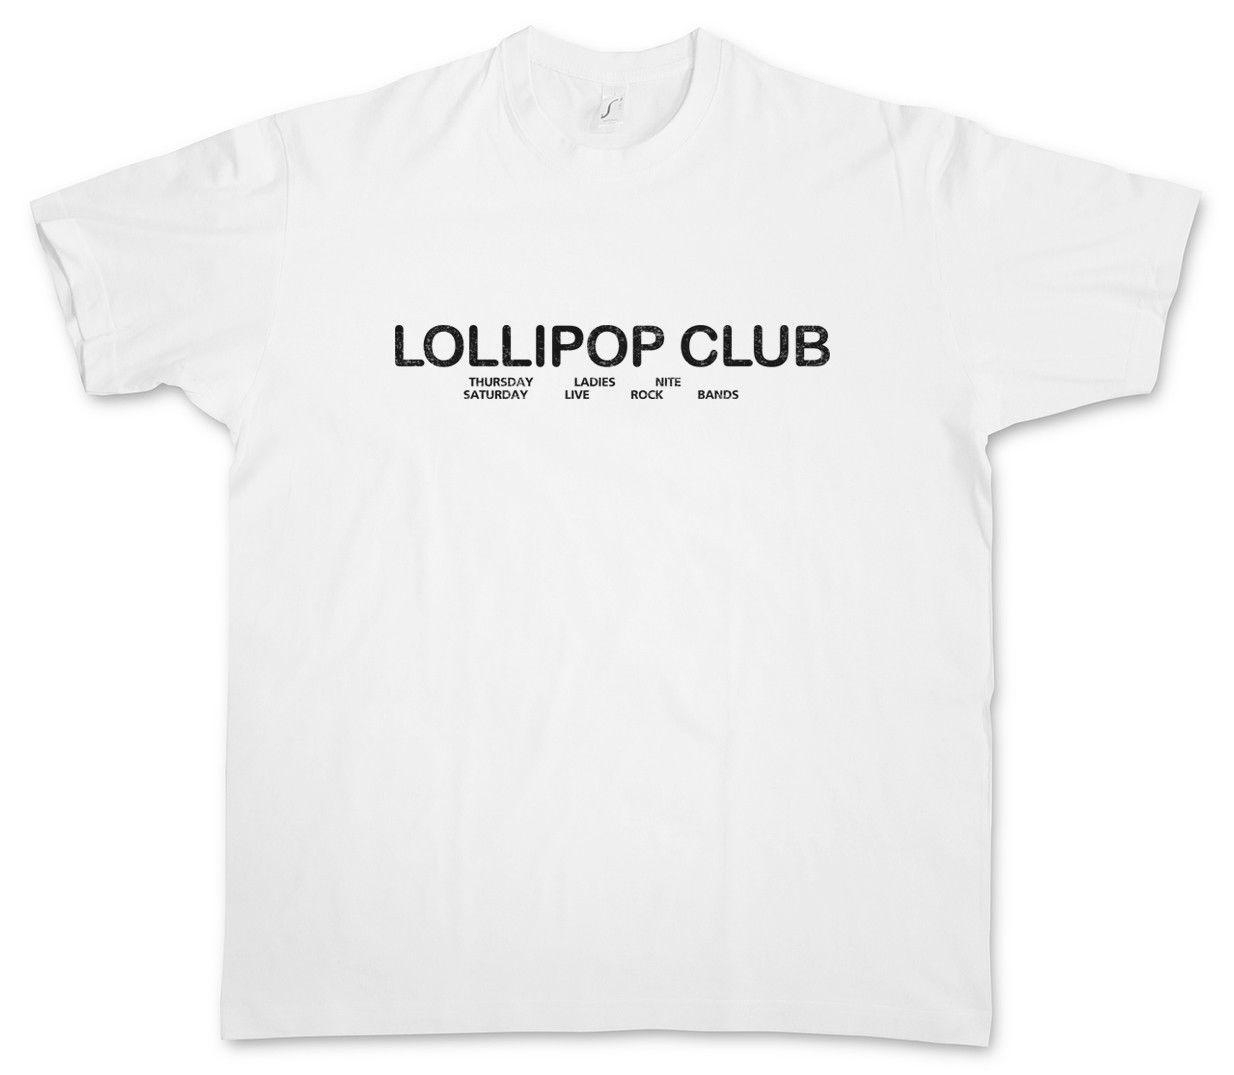 Lollipop Club T Shirt Sopranos Bar Restaurant Crazy Tony Horse Night